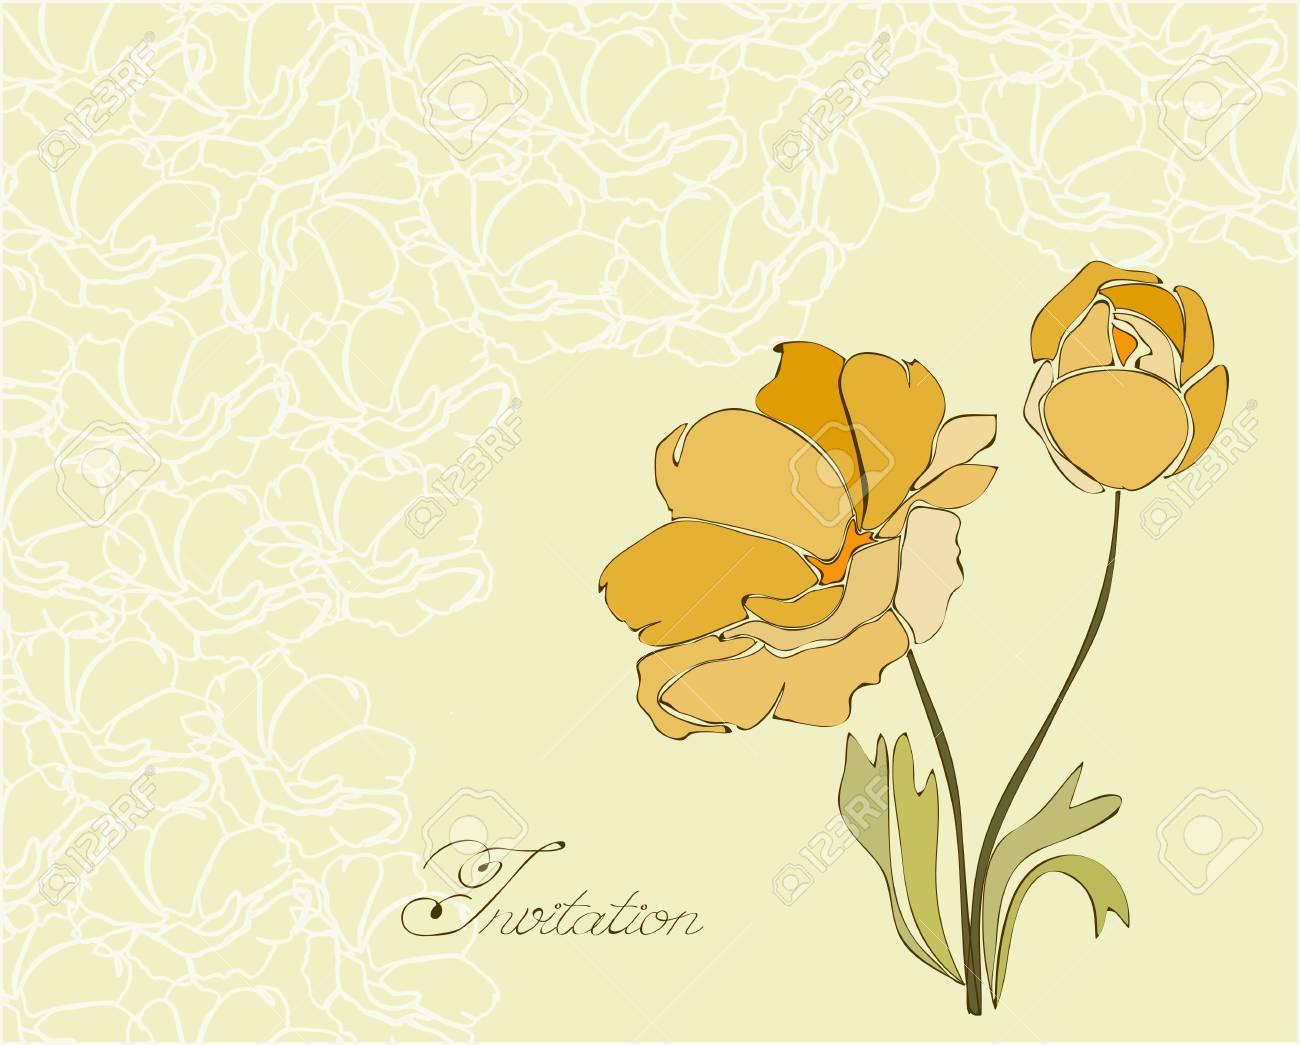 Floral Invitation Postcard in vector Stock Vector - 9044295